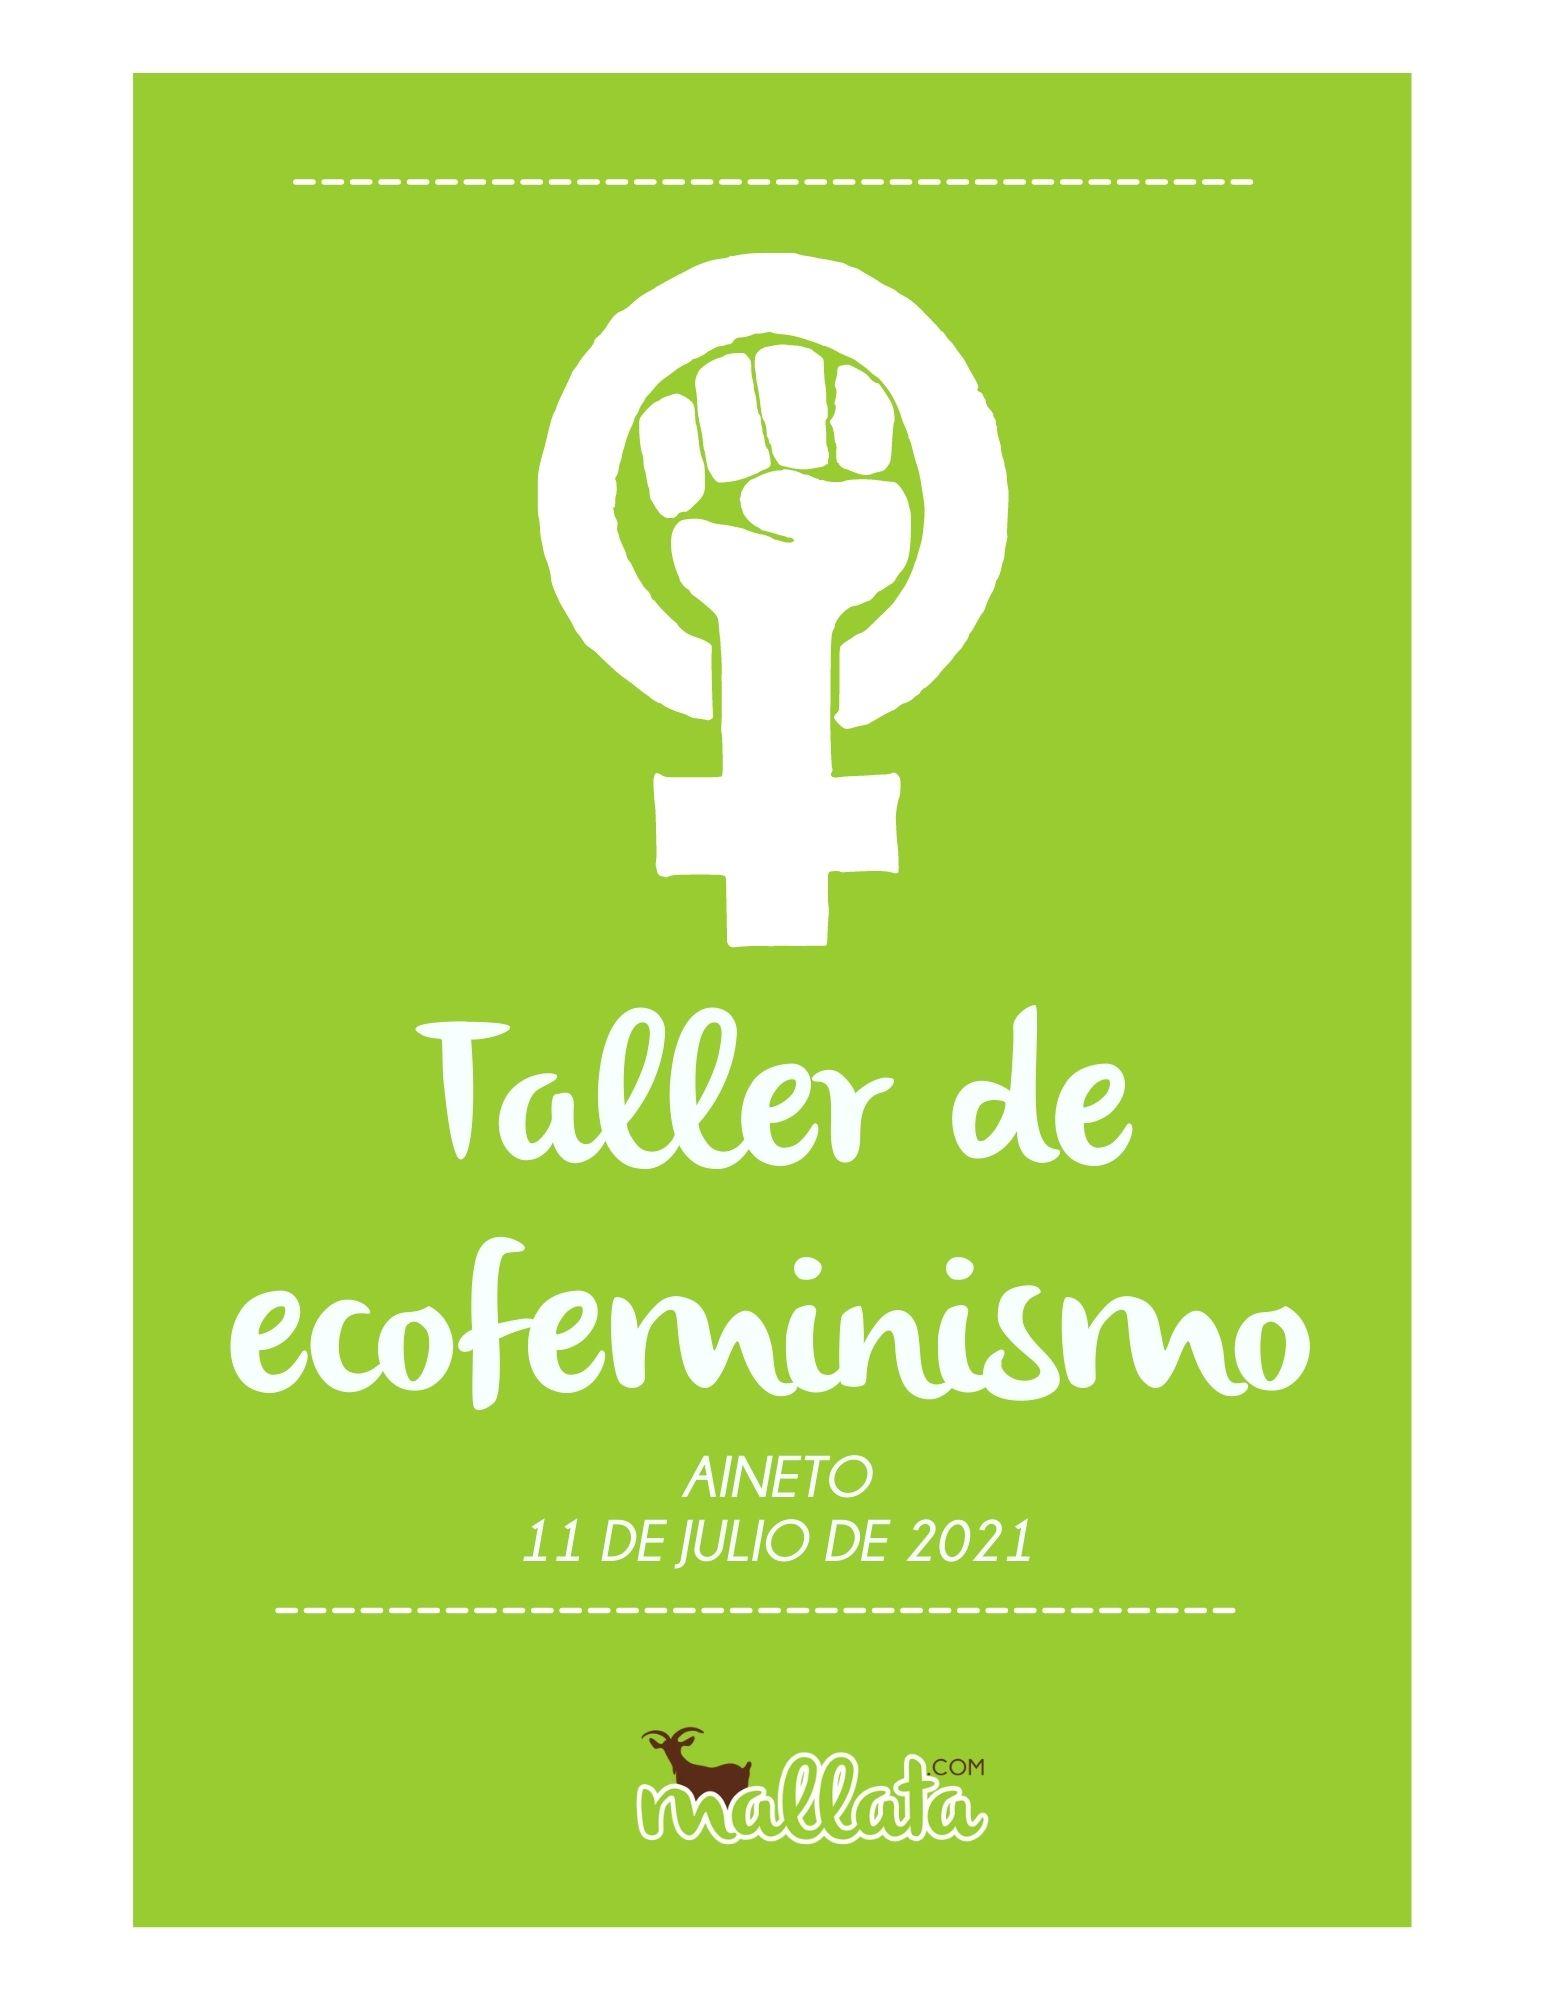 Taller ecofeminismo Aineto - Mallata